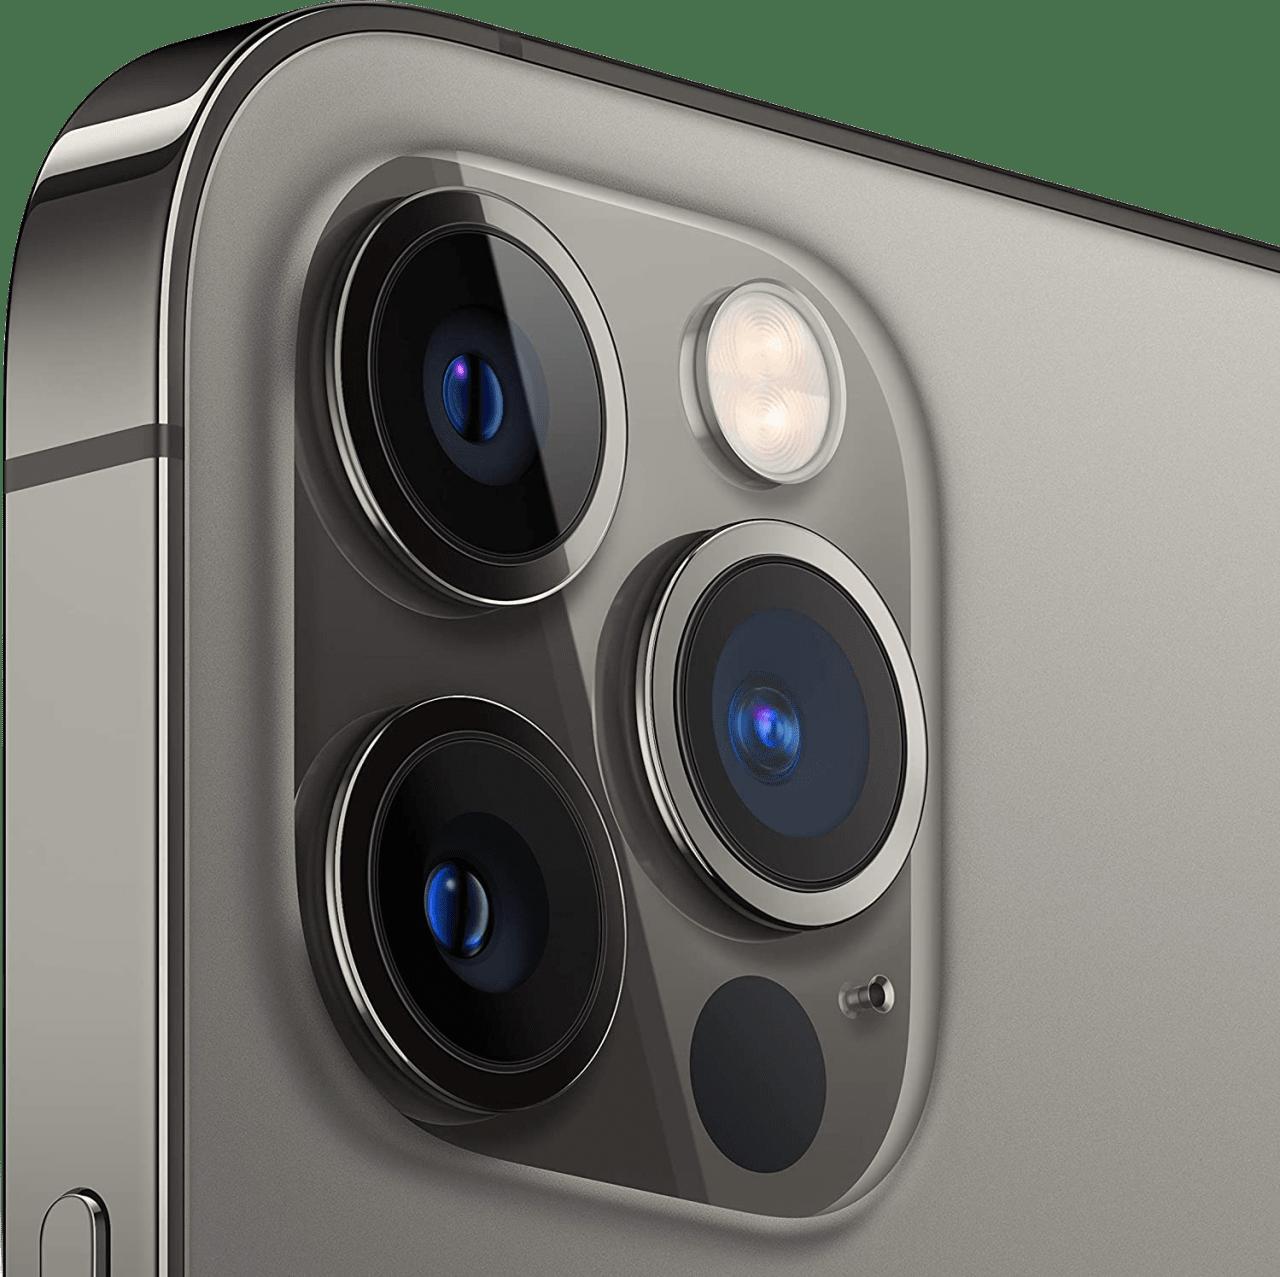 Graphite Apple iPhone 12 Pro 256GB.3